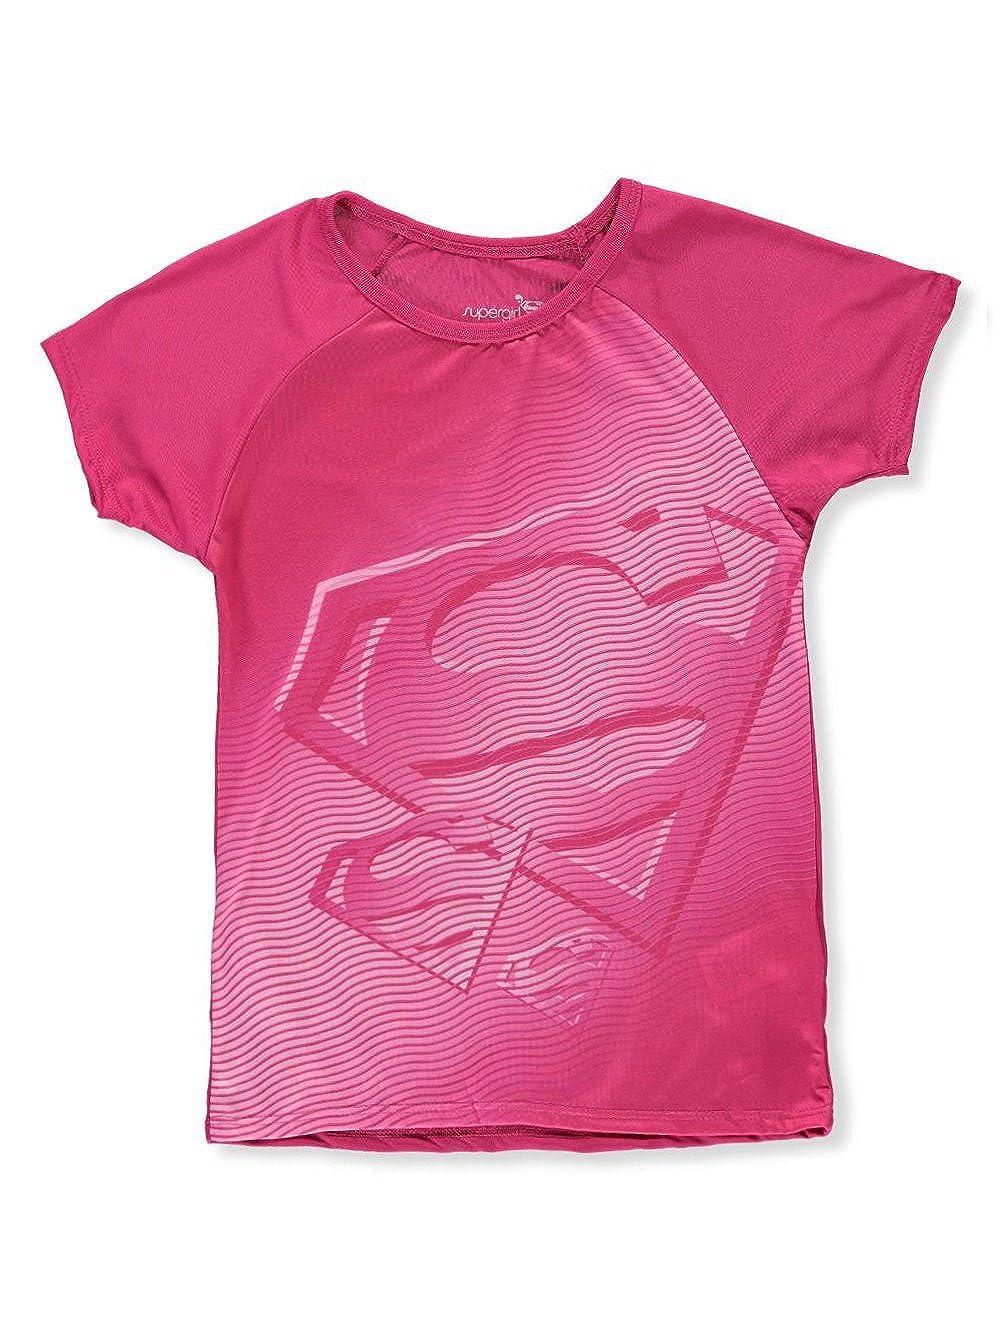 Supergirl Girls' Performance T-Shirt 10-12